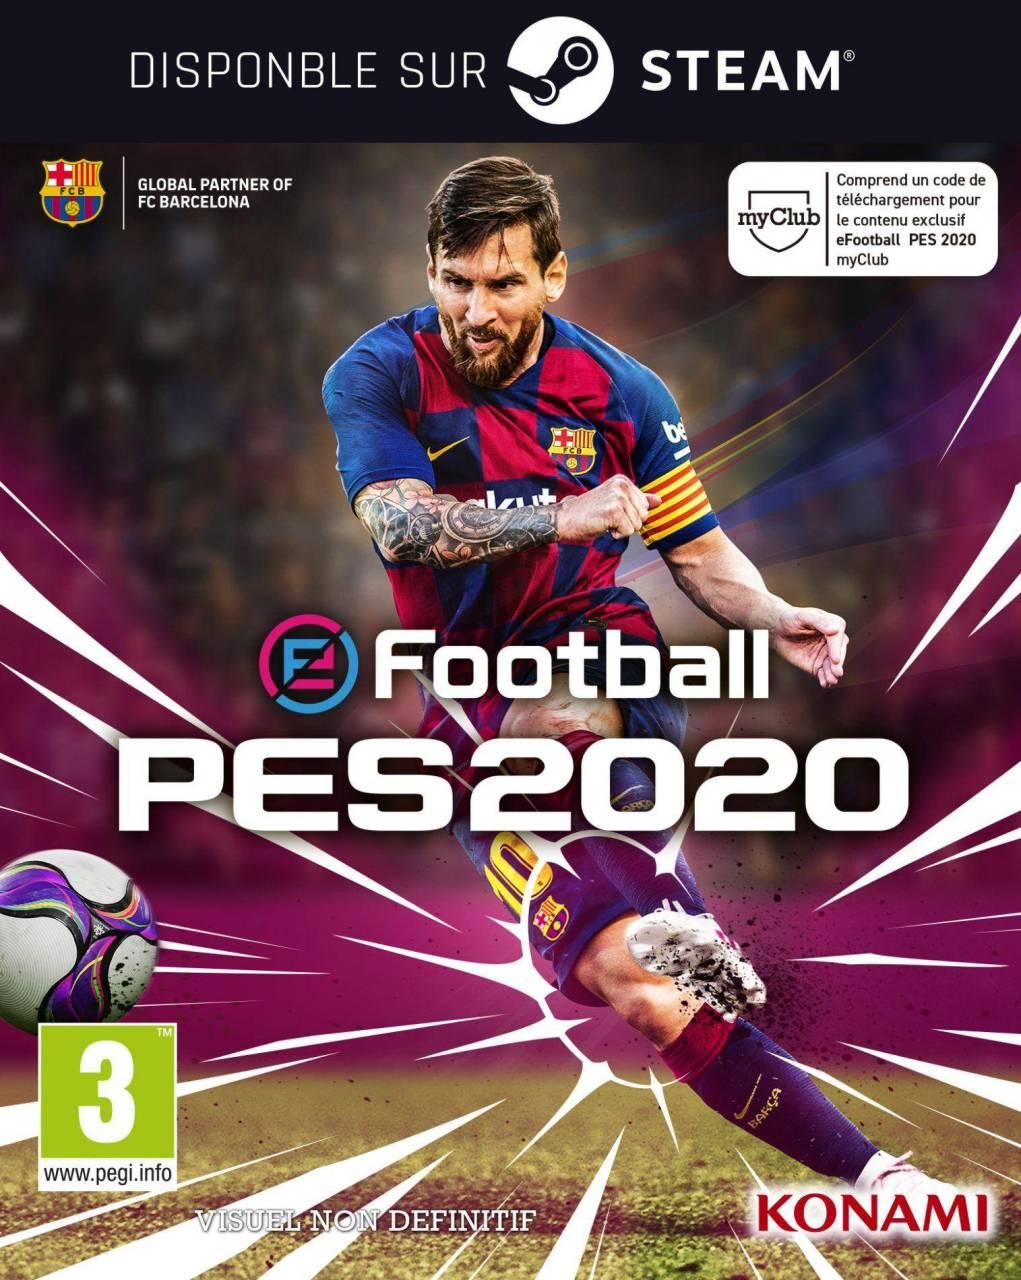 #E32019 Nuestra impresión de Pro Evolution Soccer 2020 2